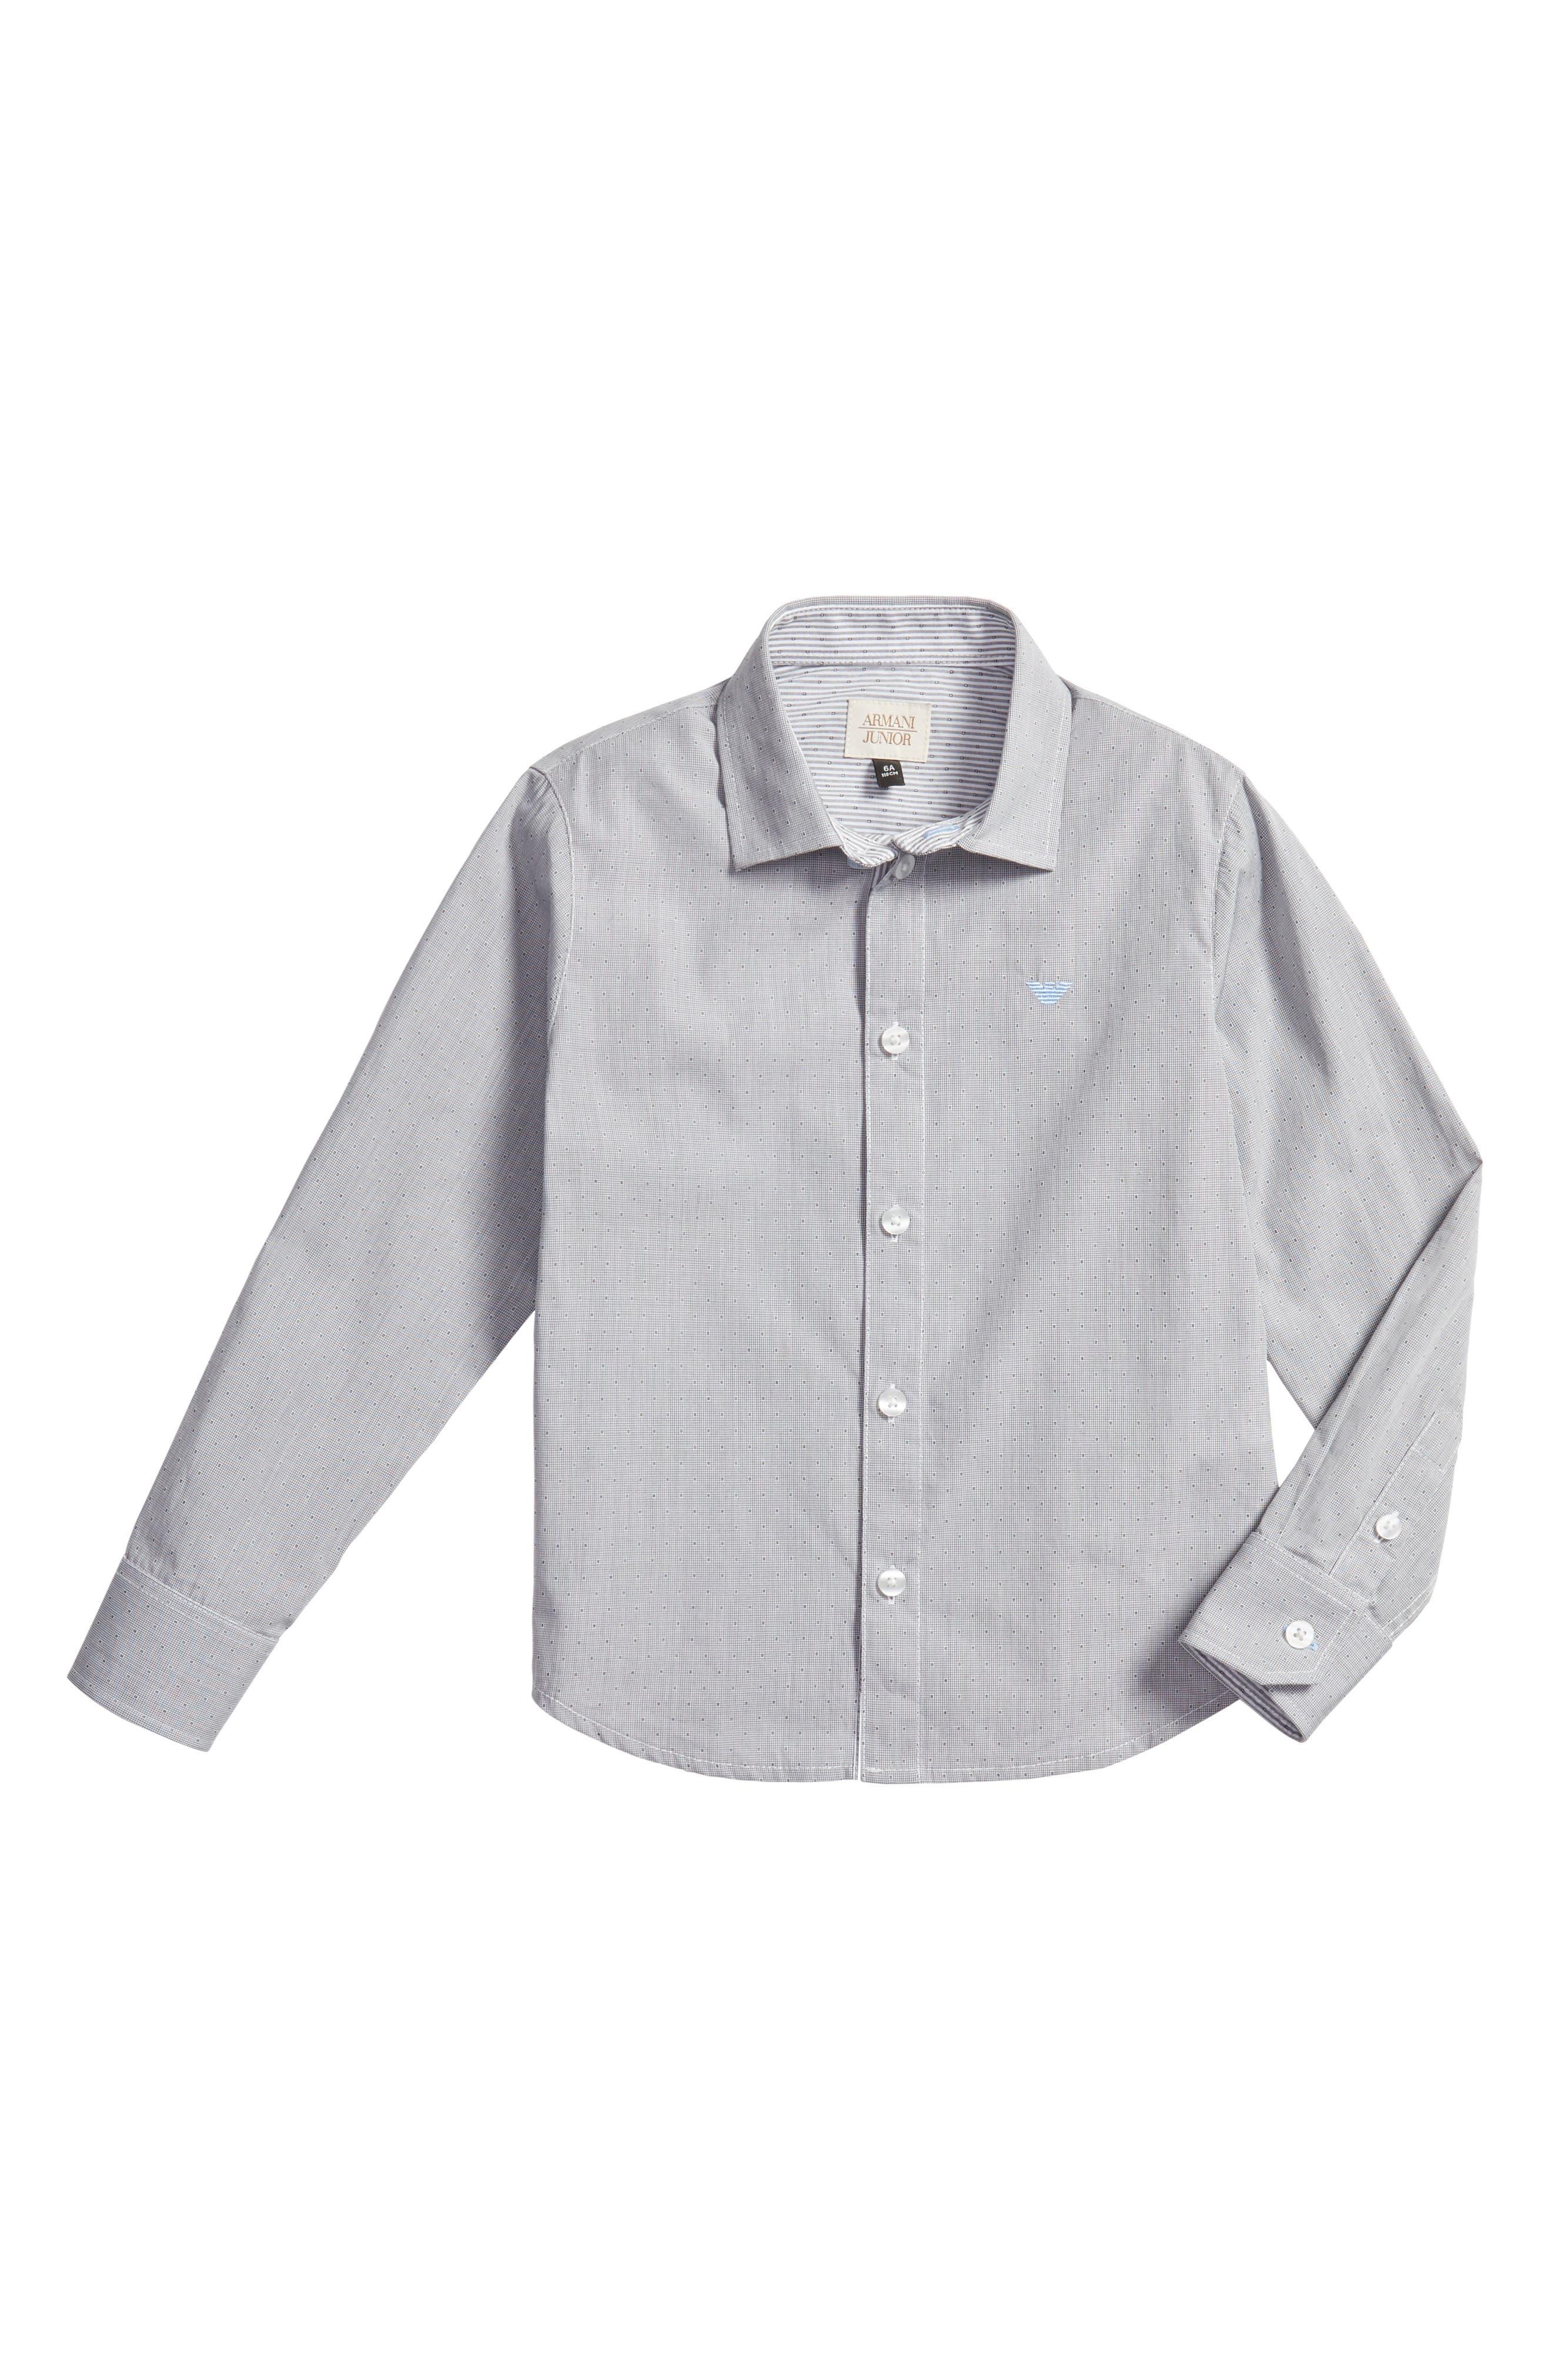 Stripe Dress Shirt,                         Main,                         color, 484